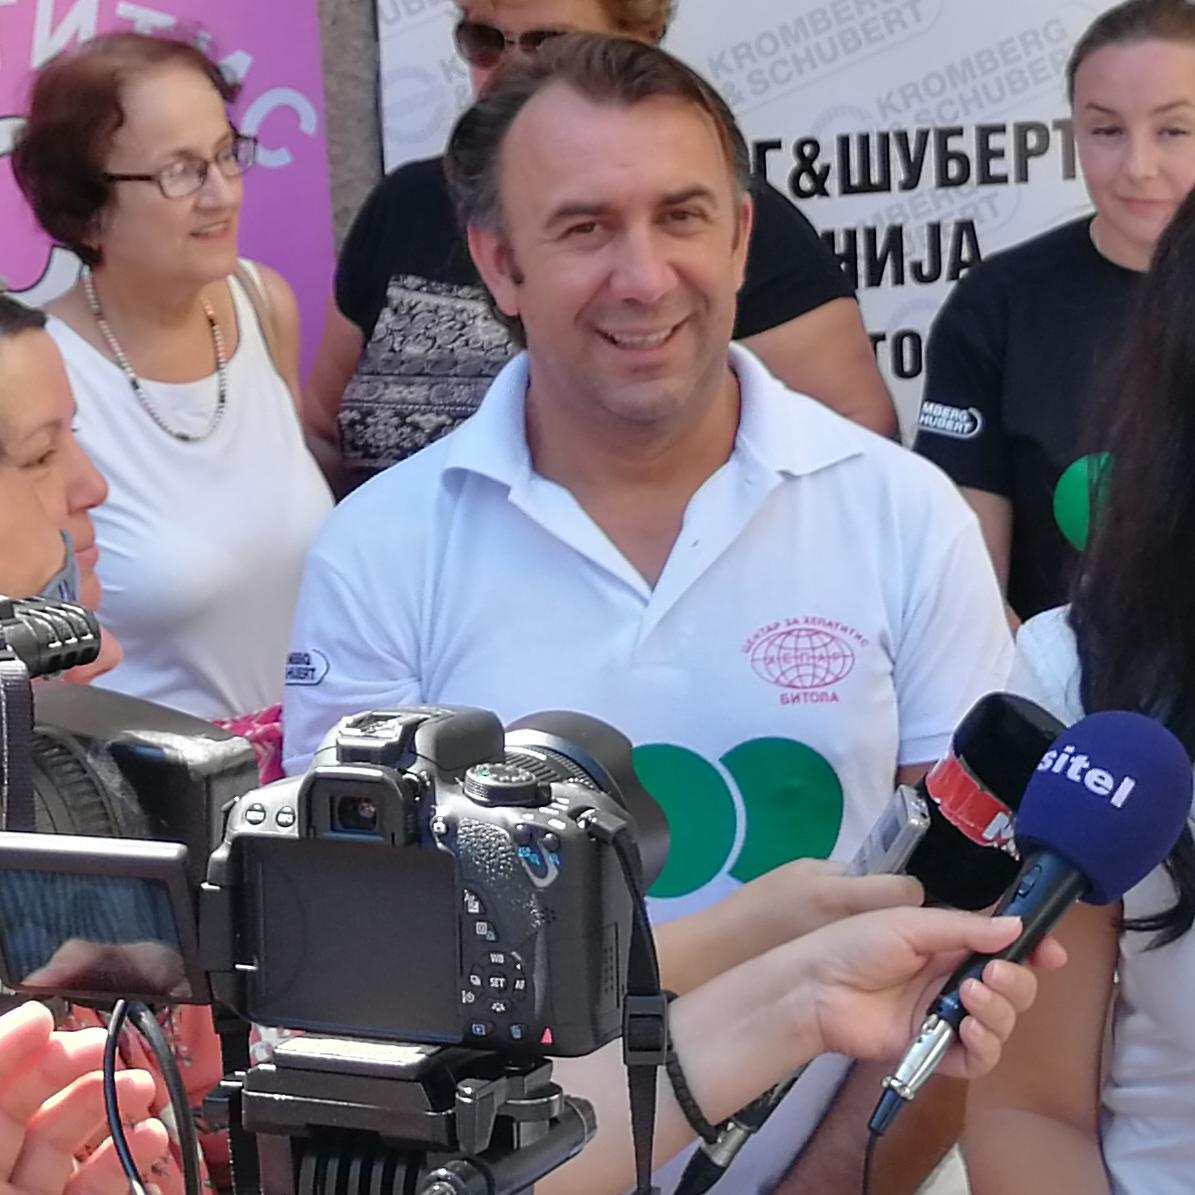 NOhep Supporter Spotlight: Milan Mishkovikj